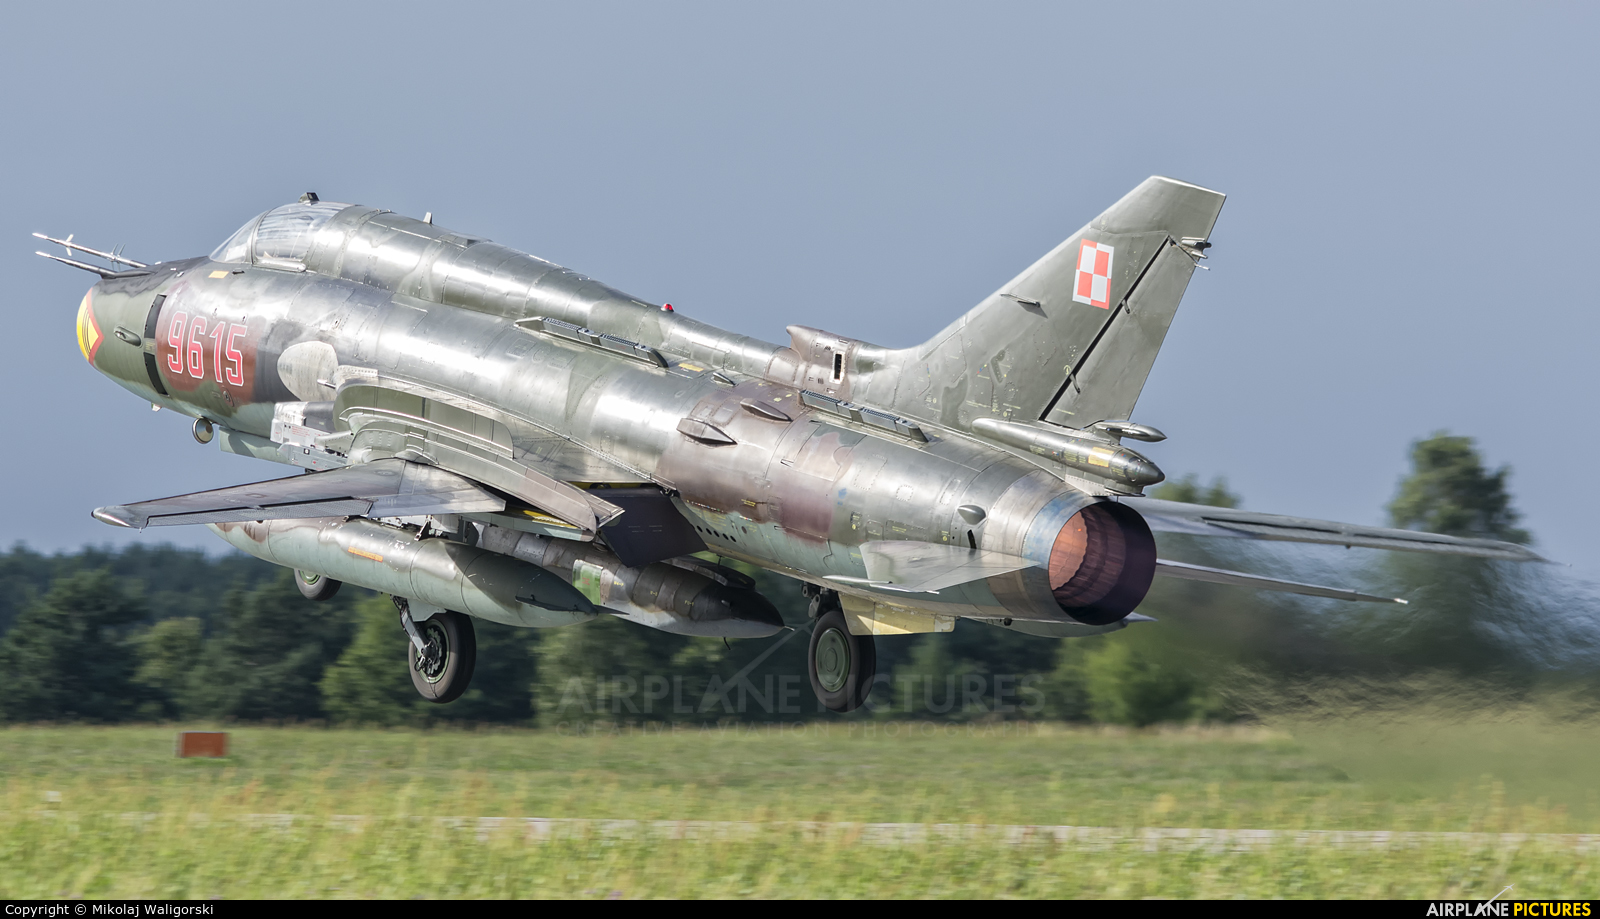 Poland - Air Force 9615 aircraft at Mirosławiec